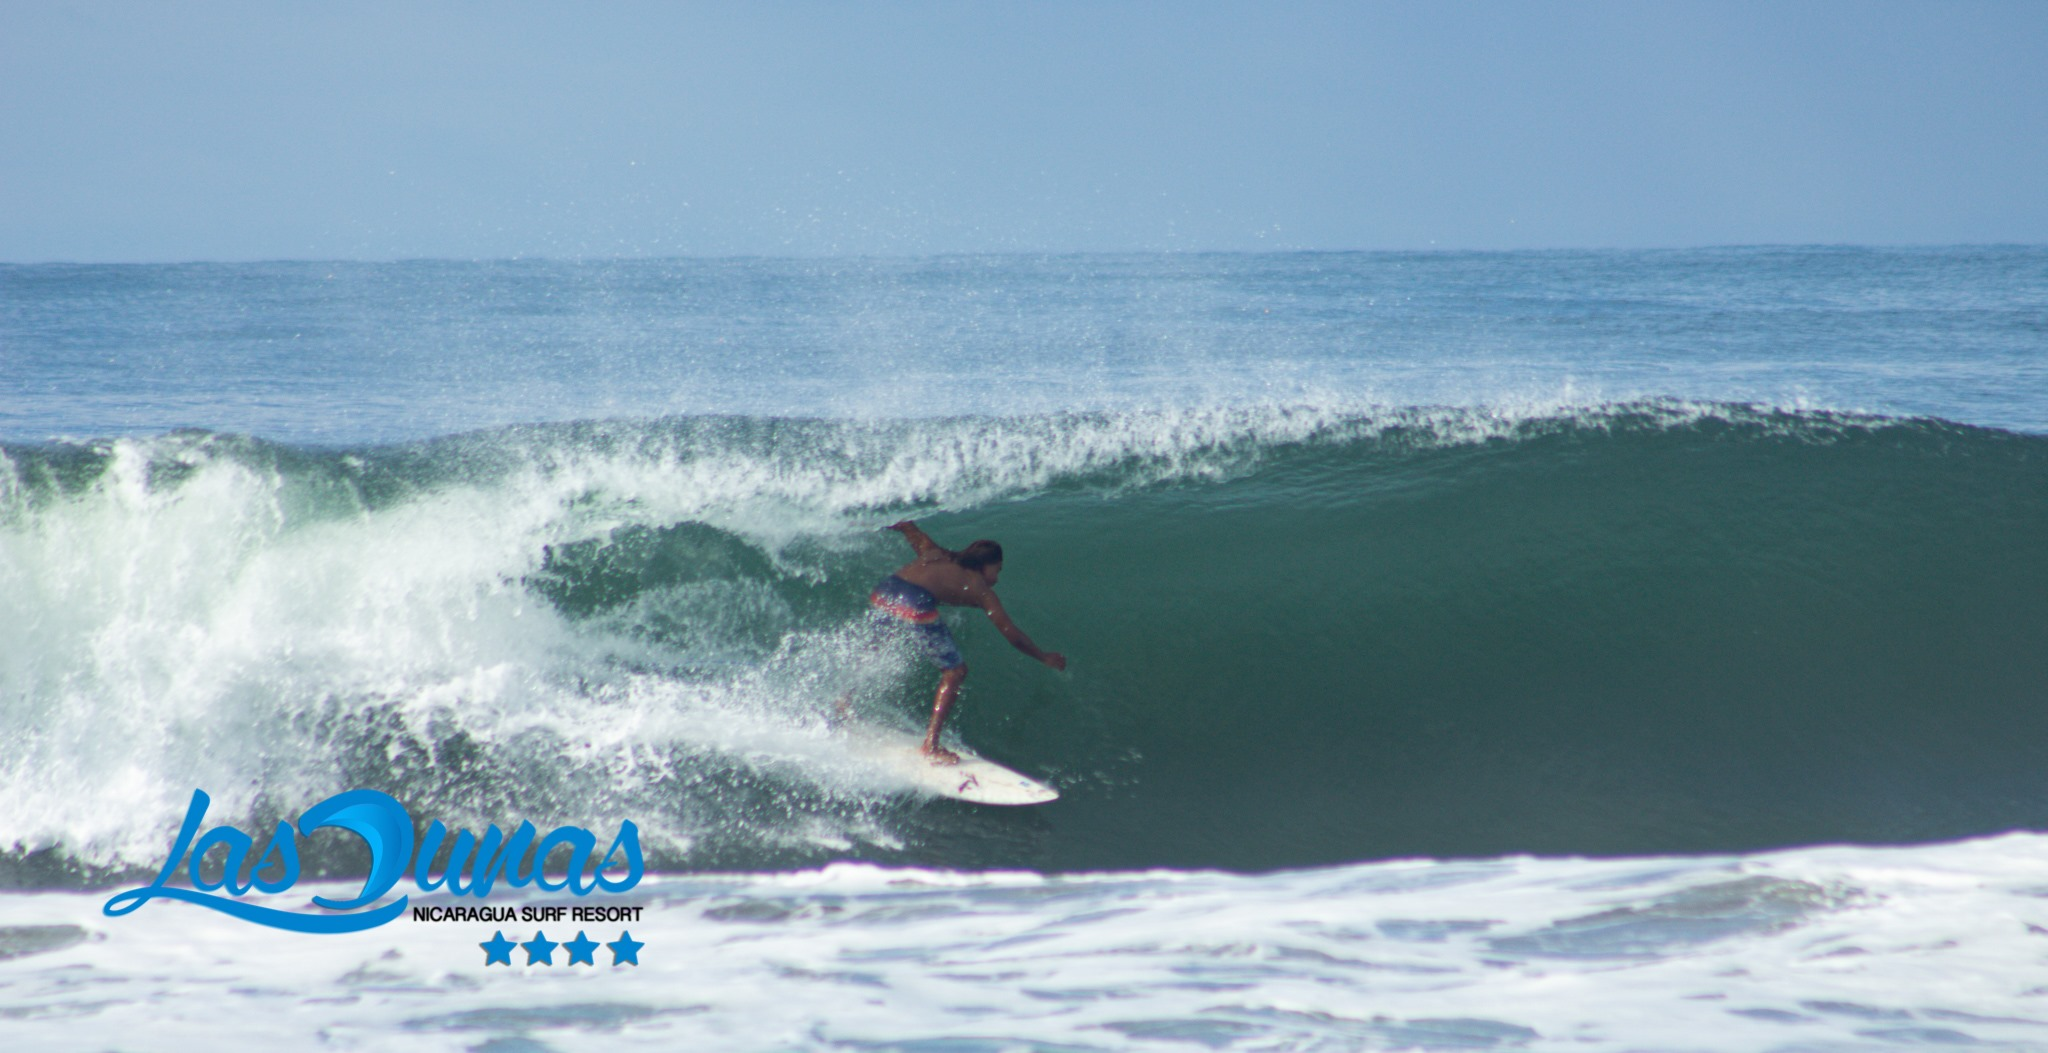 Surf in Las Dunas Surf Resort, Aposentillo, Nicaragua.